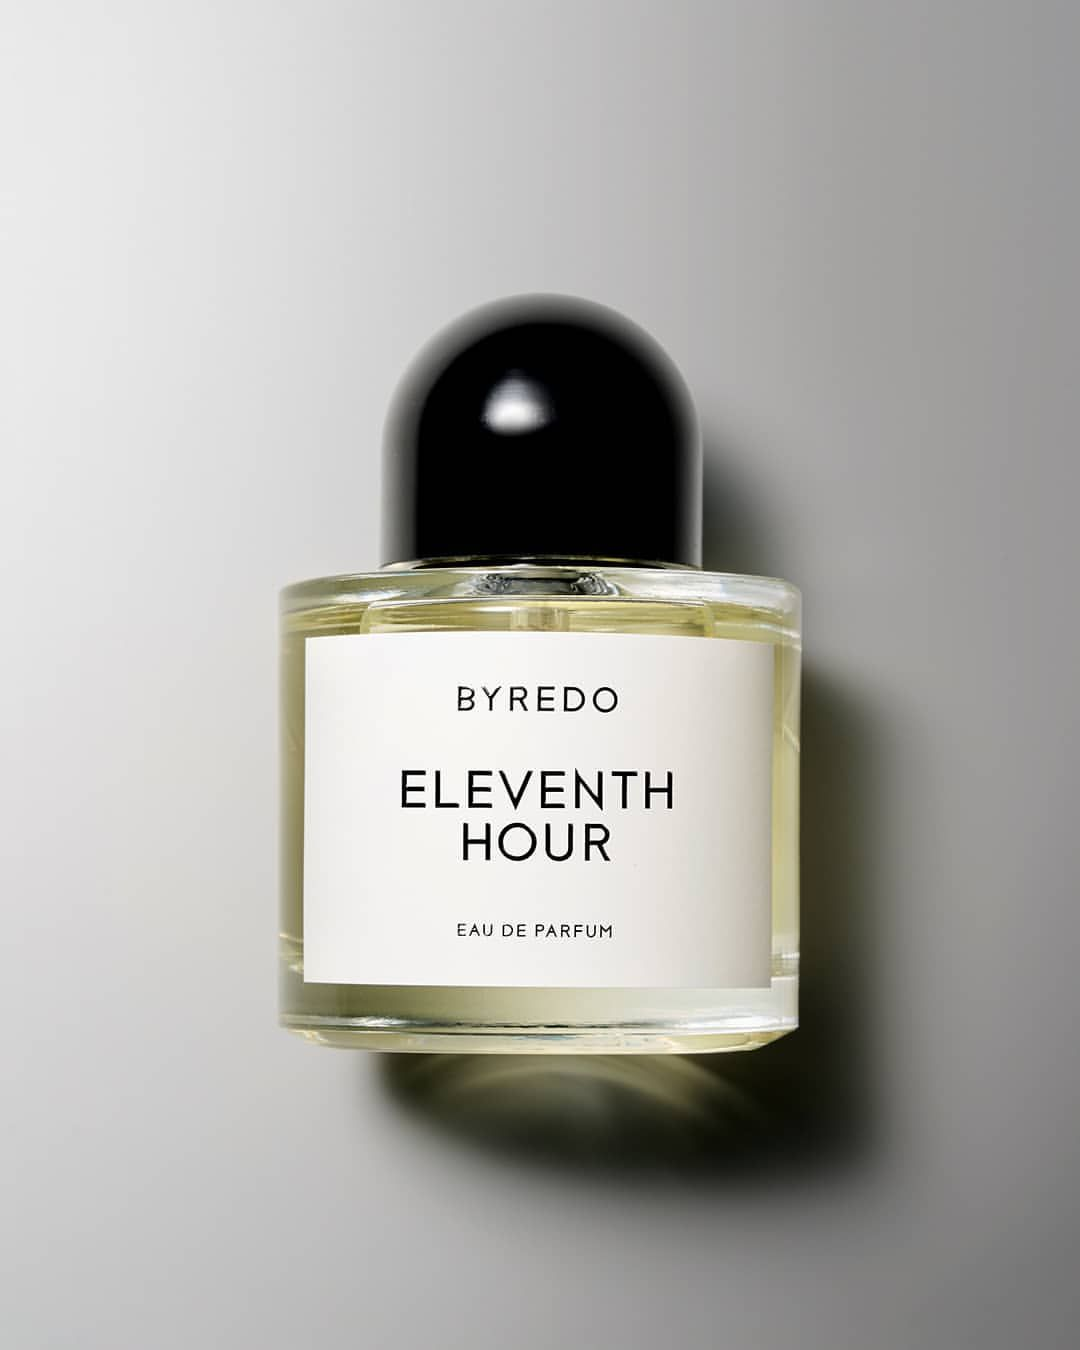 9fe087816613 Eleventh Hour Eau de Parfum Exclusive prelaunch on Byredo.com Limited  quantities Link in bio Notes To